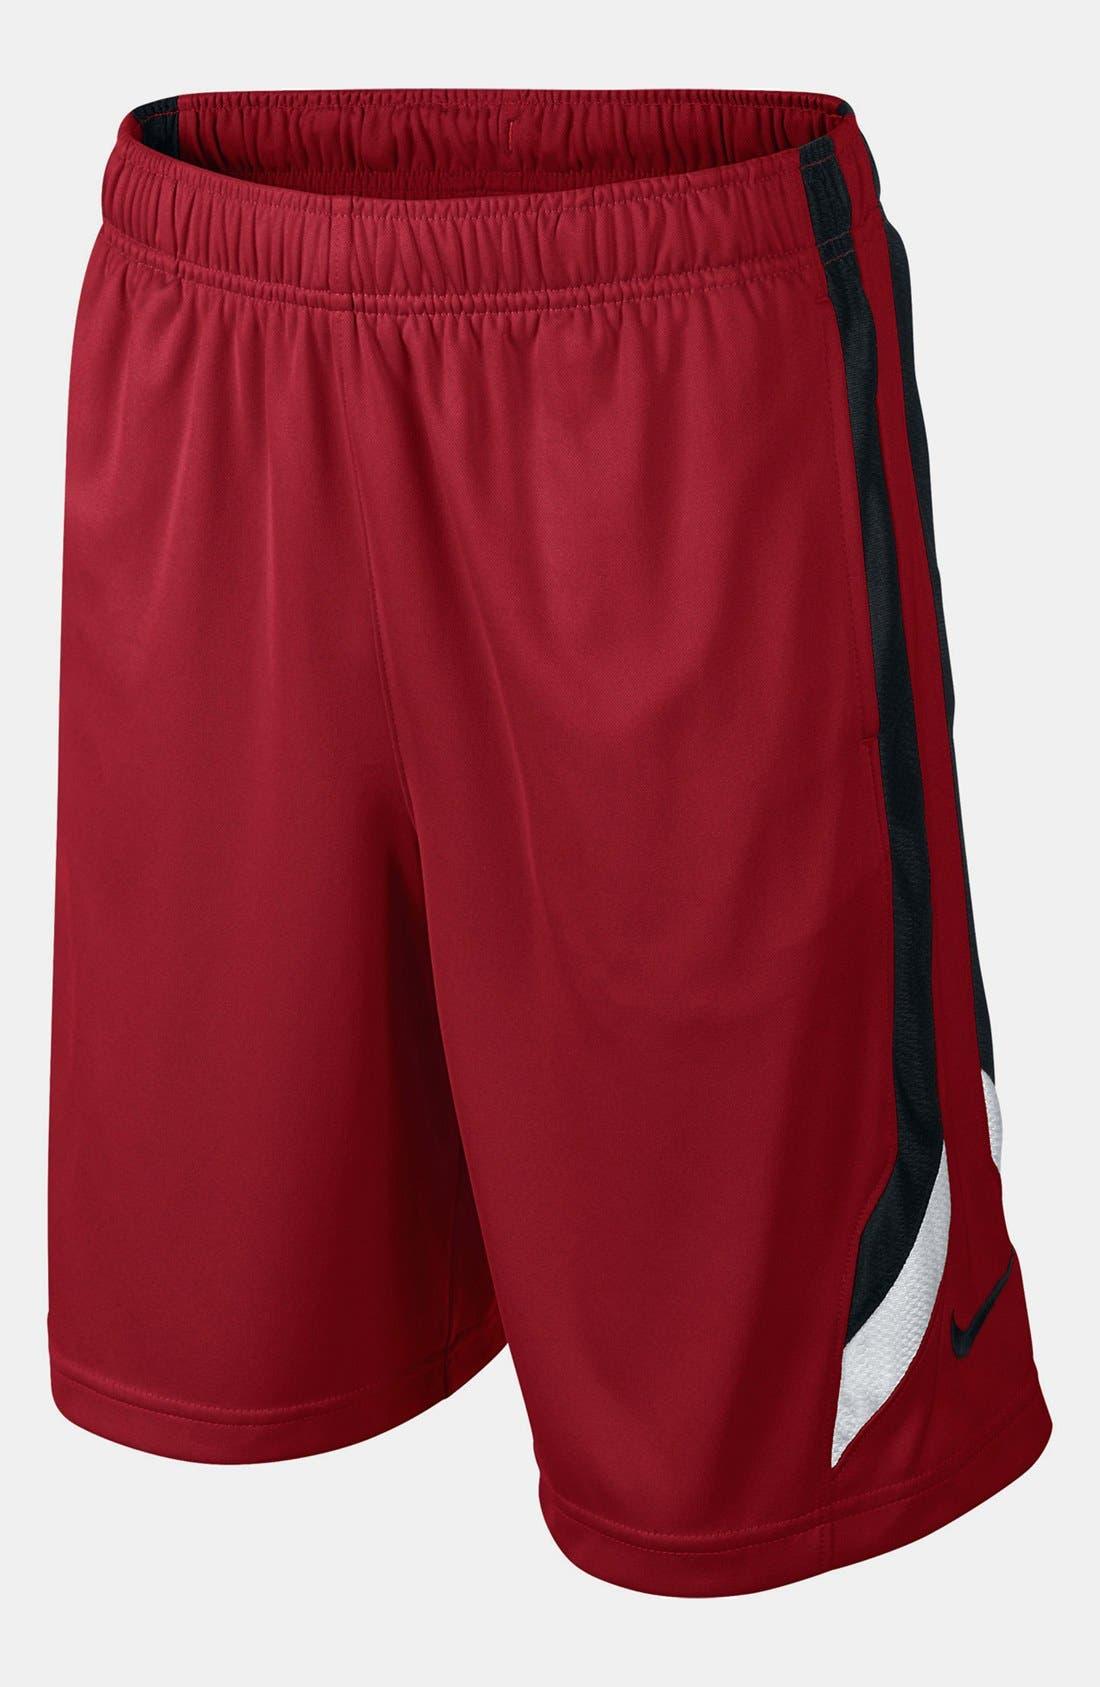 Main Image - Nike 'Super Fast' Dri-FIT Basketball Shorts (Big Boys)